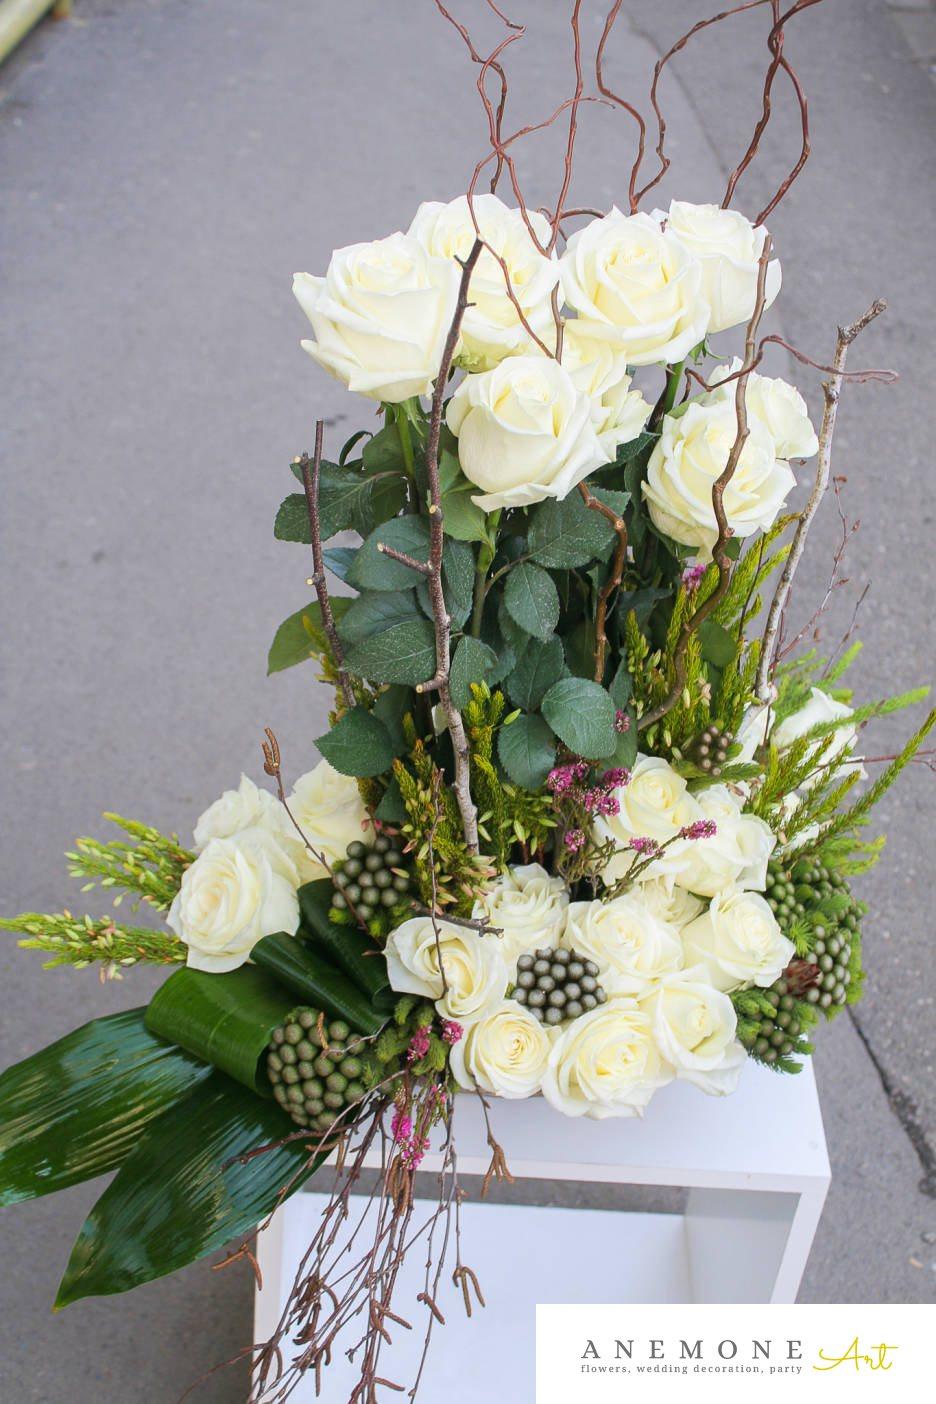 Poza, foto cu Flori de nunta alb, crengi, decor masa, trandafiri in Arad, Timisoara, Oradea (wedding flowers, bouquets) nunta Arad, Timisoara, Oradea